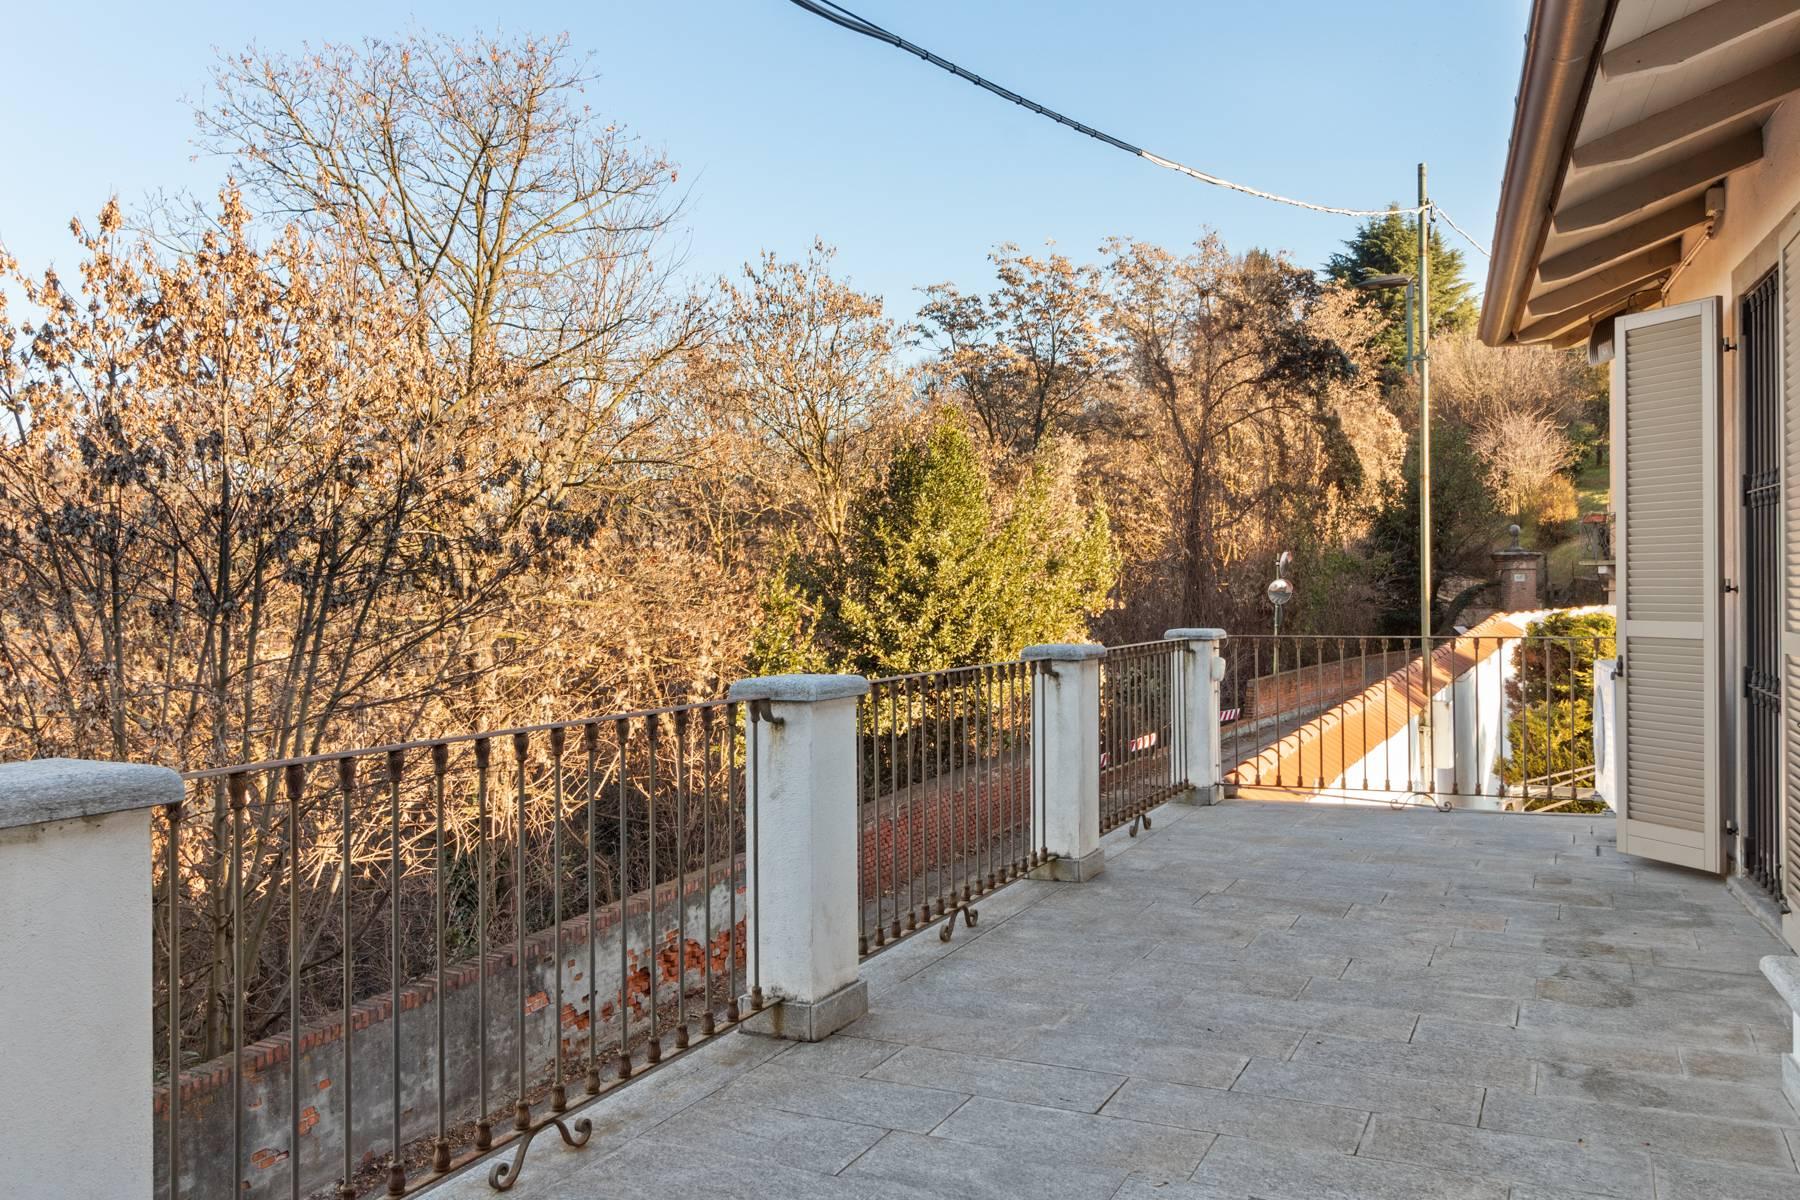 Casa indipendente in Vendita a Torino: 5 locali, 270 mq - Foto 13